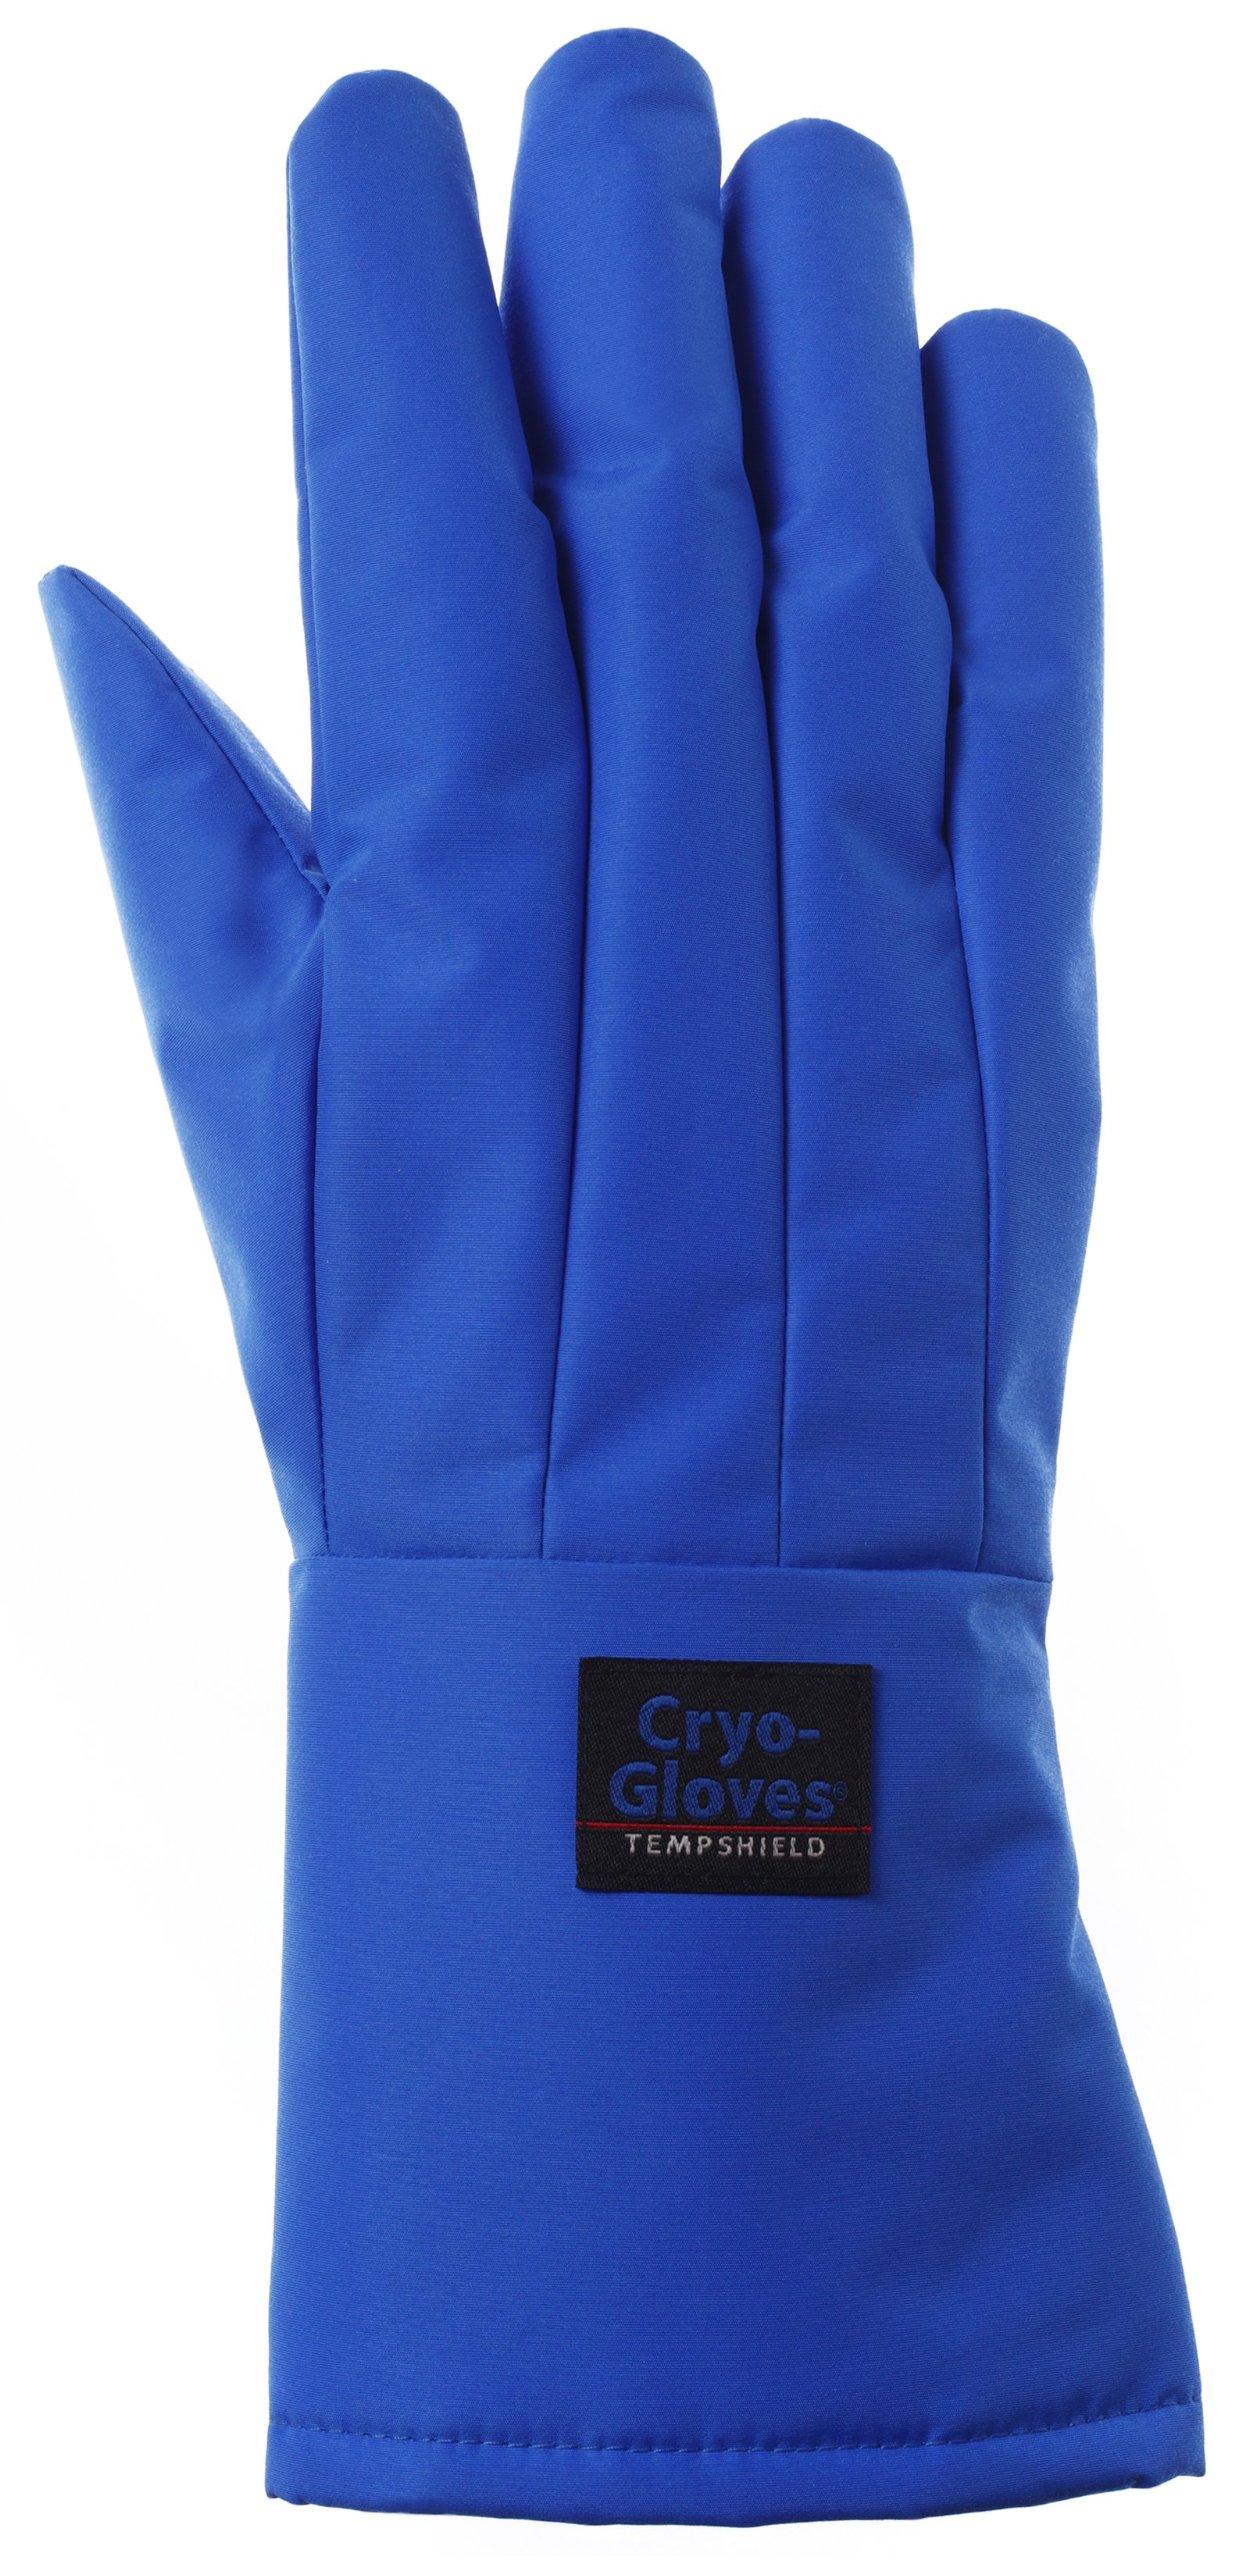 Cryo-Gloves MAXL Cryogenic Gloves, Mid-Arm, Extra Large